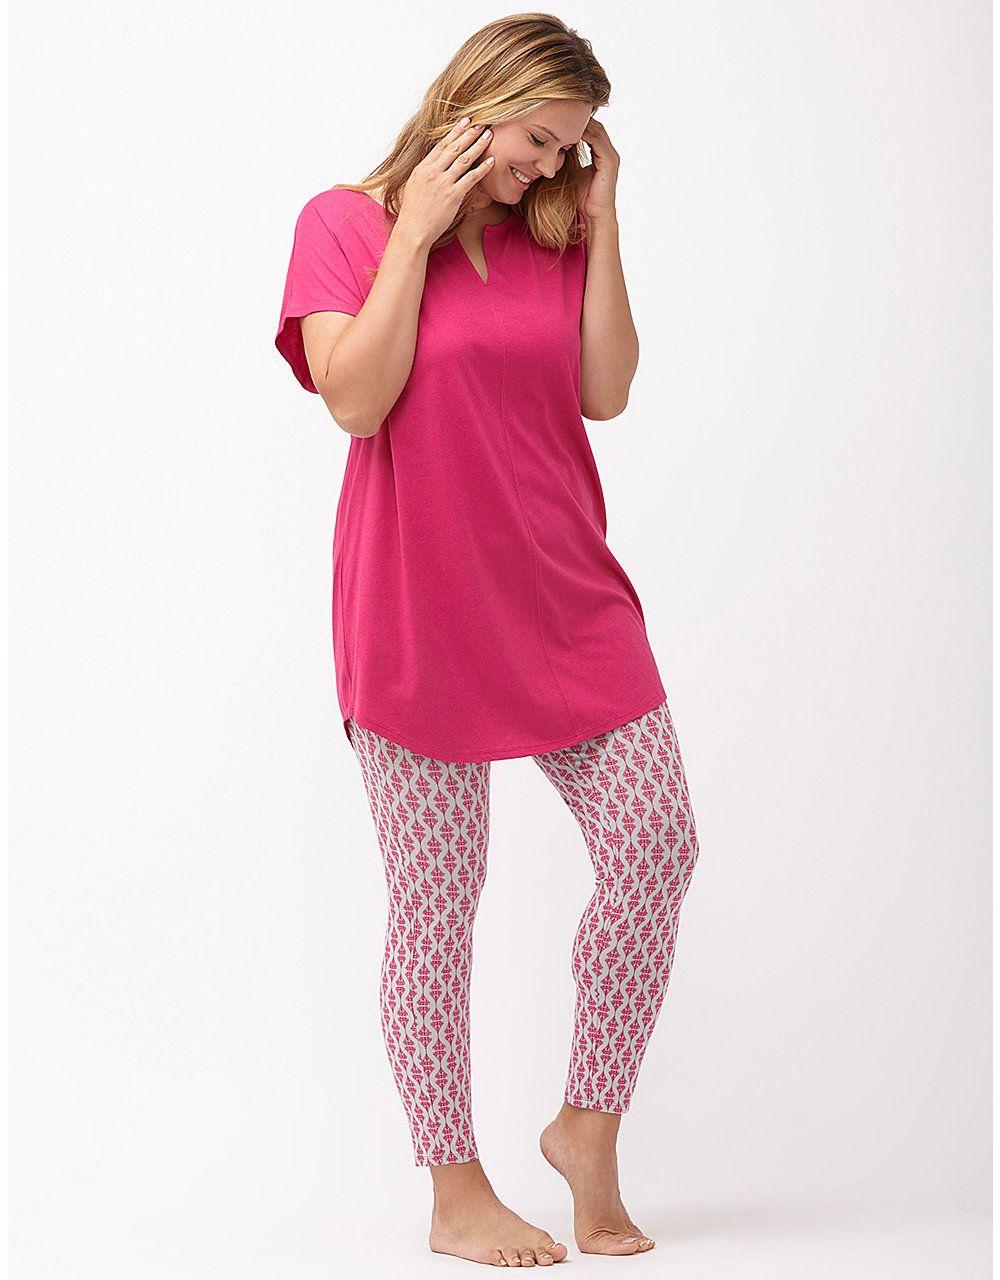 b20dfd00d3a Printed legging PJ set by Cacique